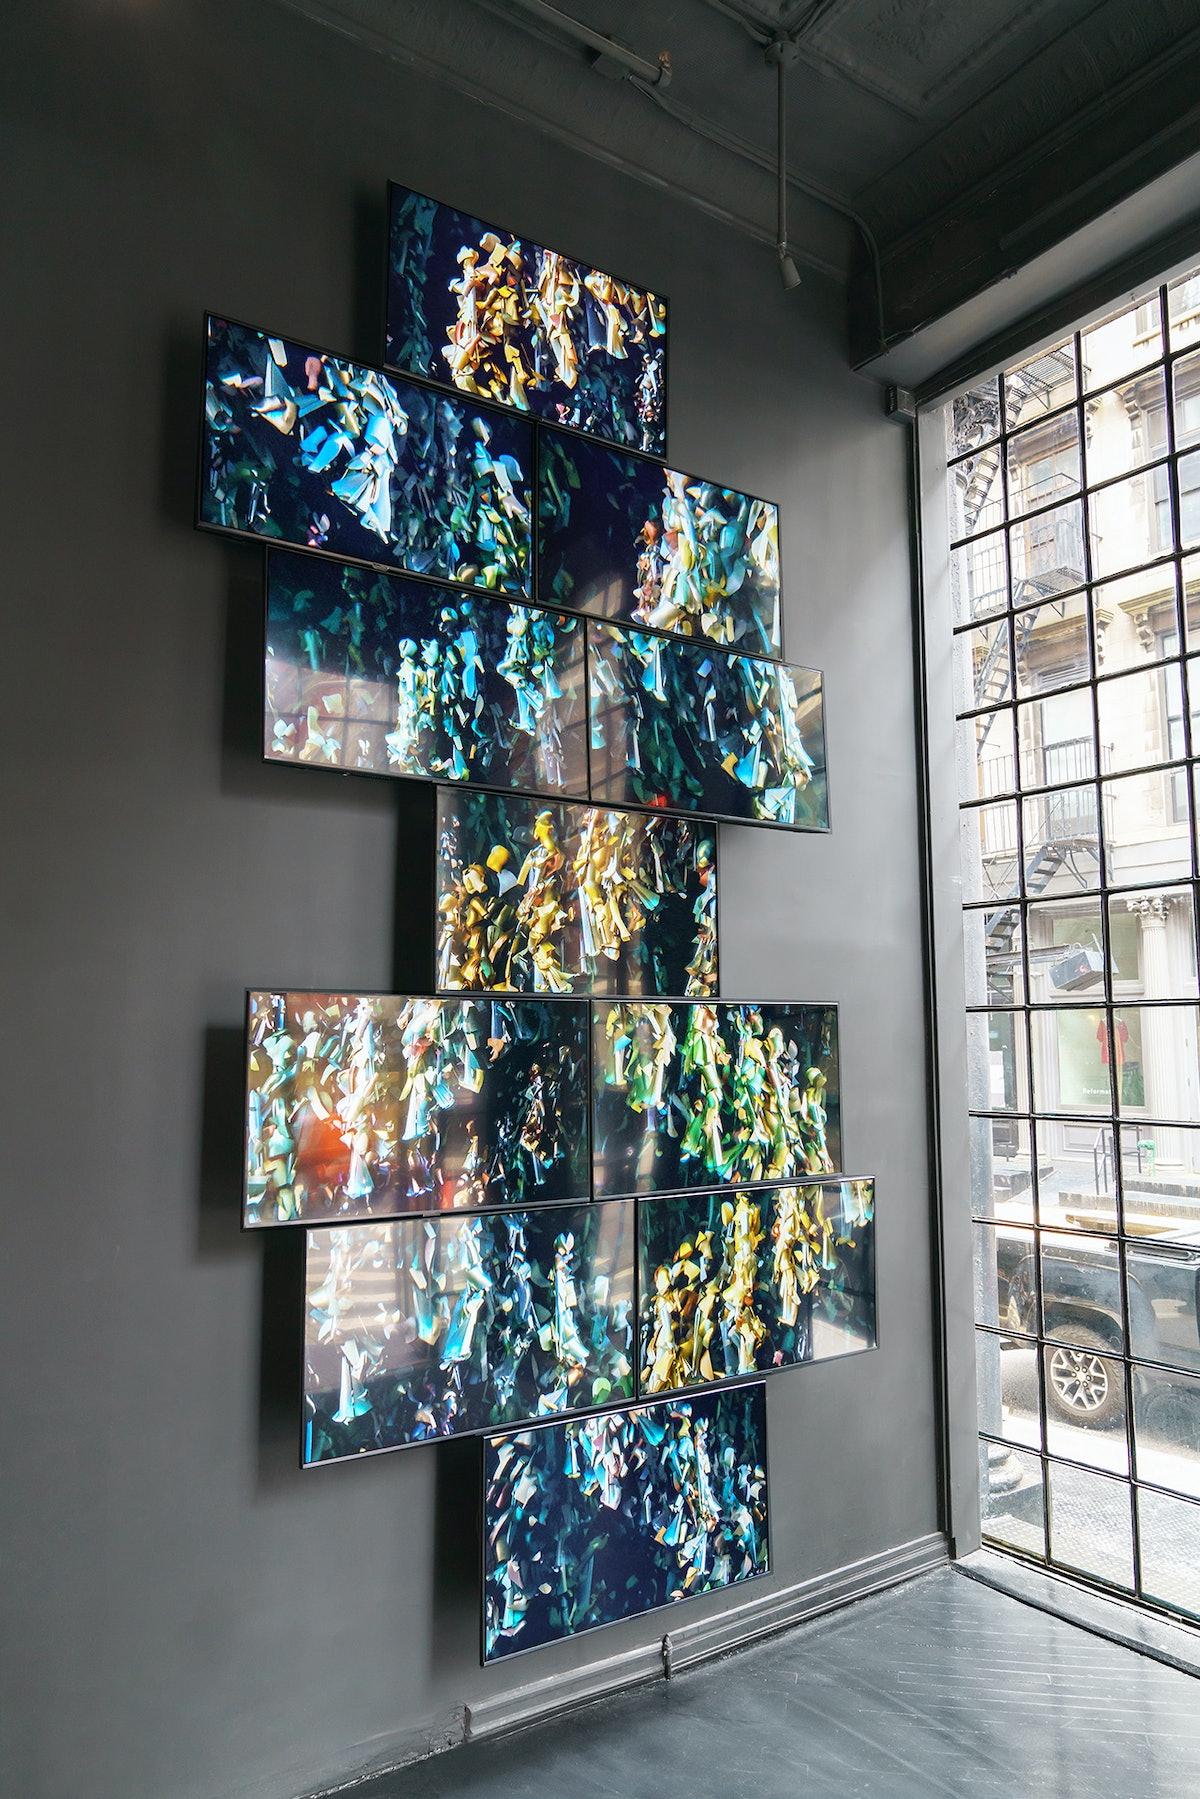 Marco Brambilla's installation for Maison Margiela